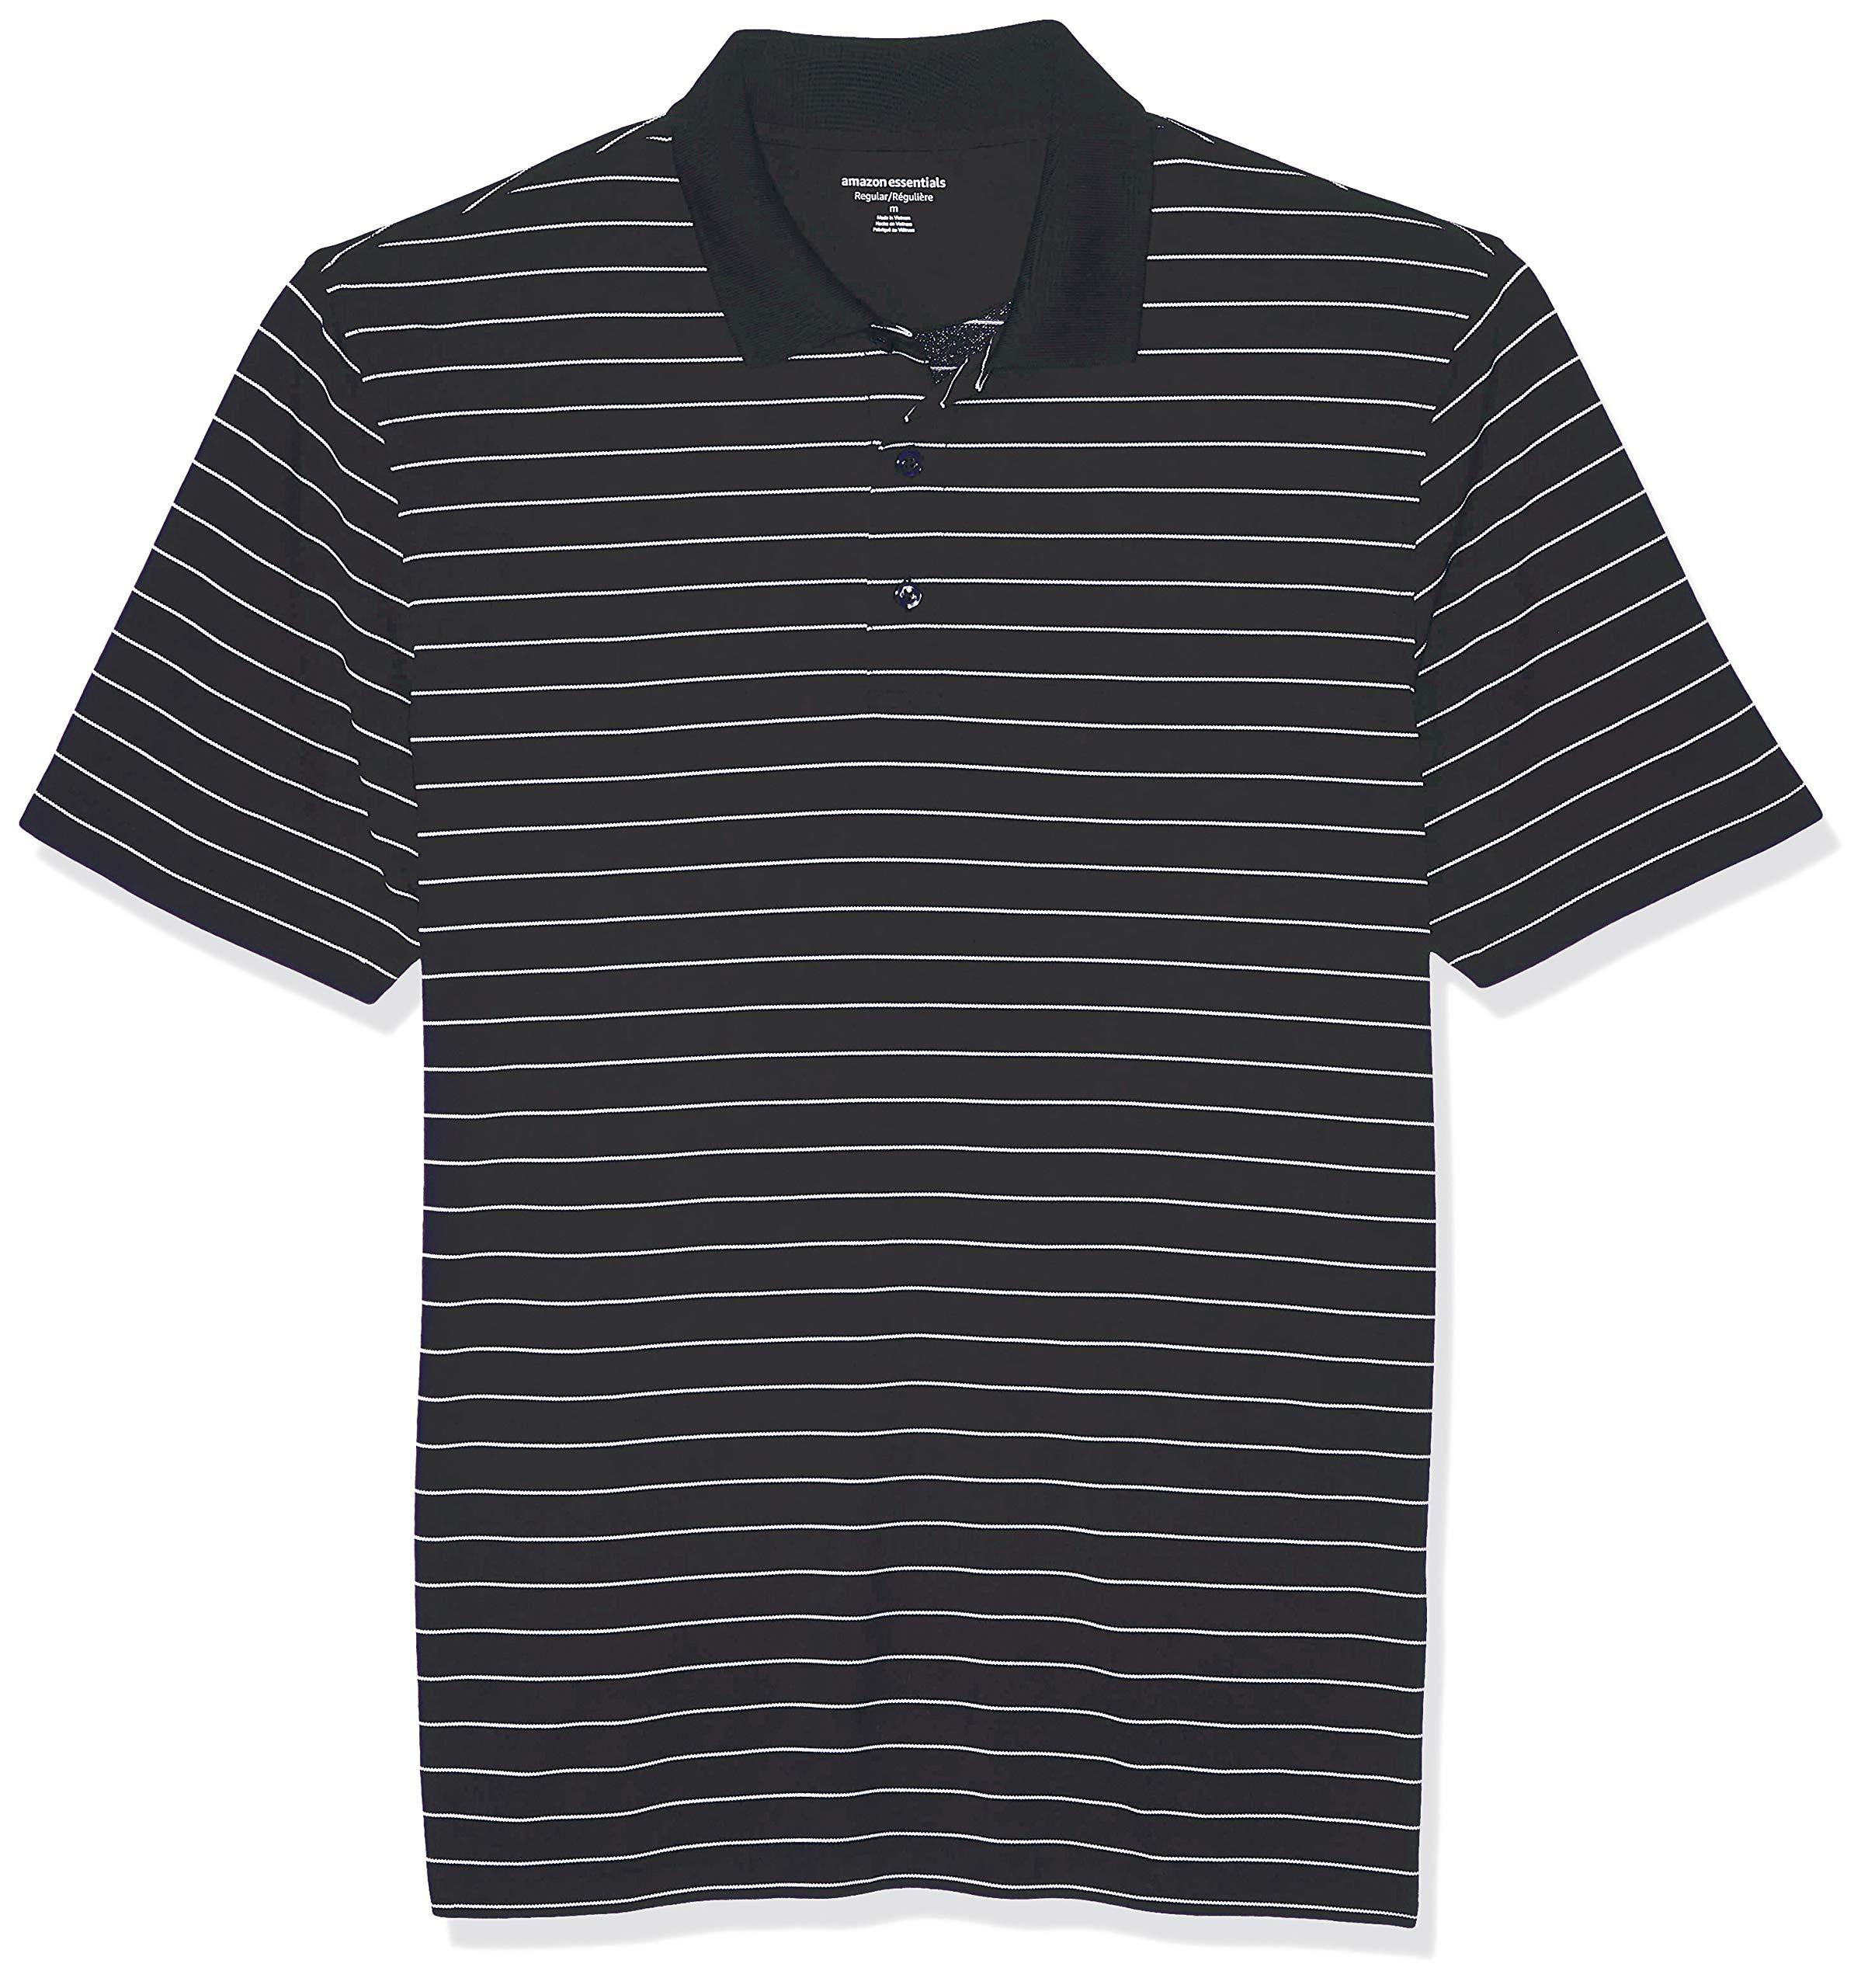 Amazon Essentials Men's Regular-Fit Quick-Dry Golf Polo Shirt, Black Stripe, X-Small